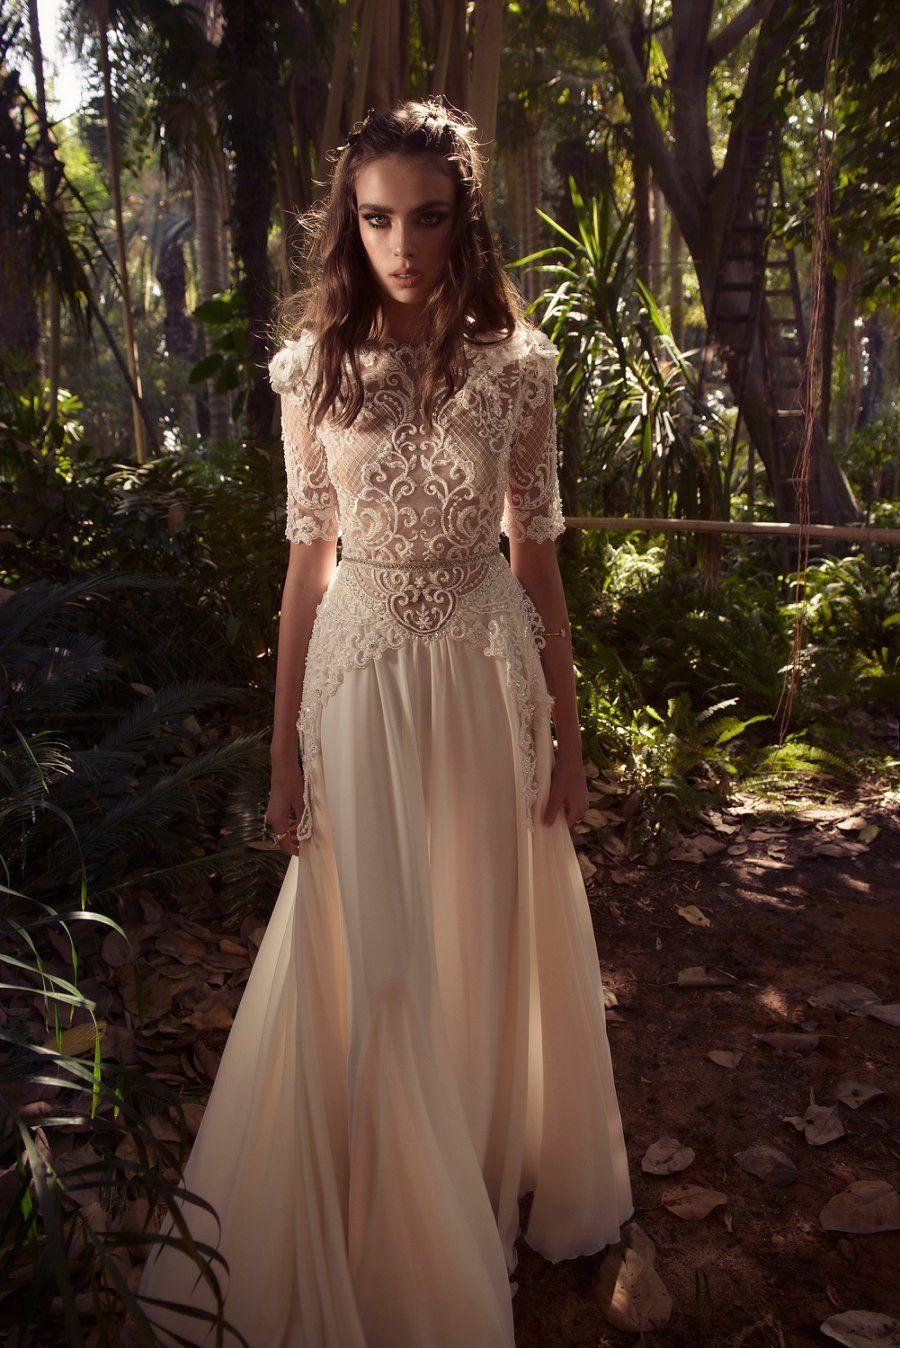 Gorgeously dreamy yaki ravid wedding dresses for wedding